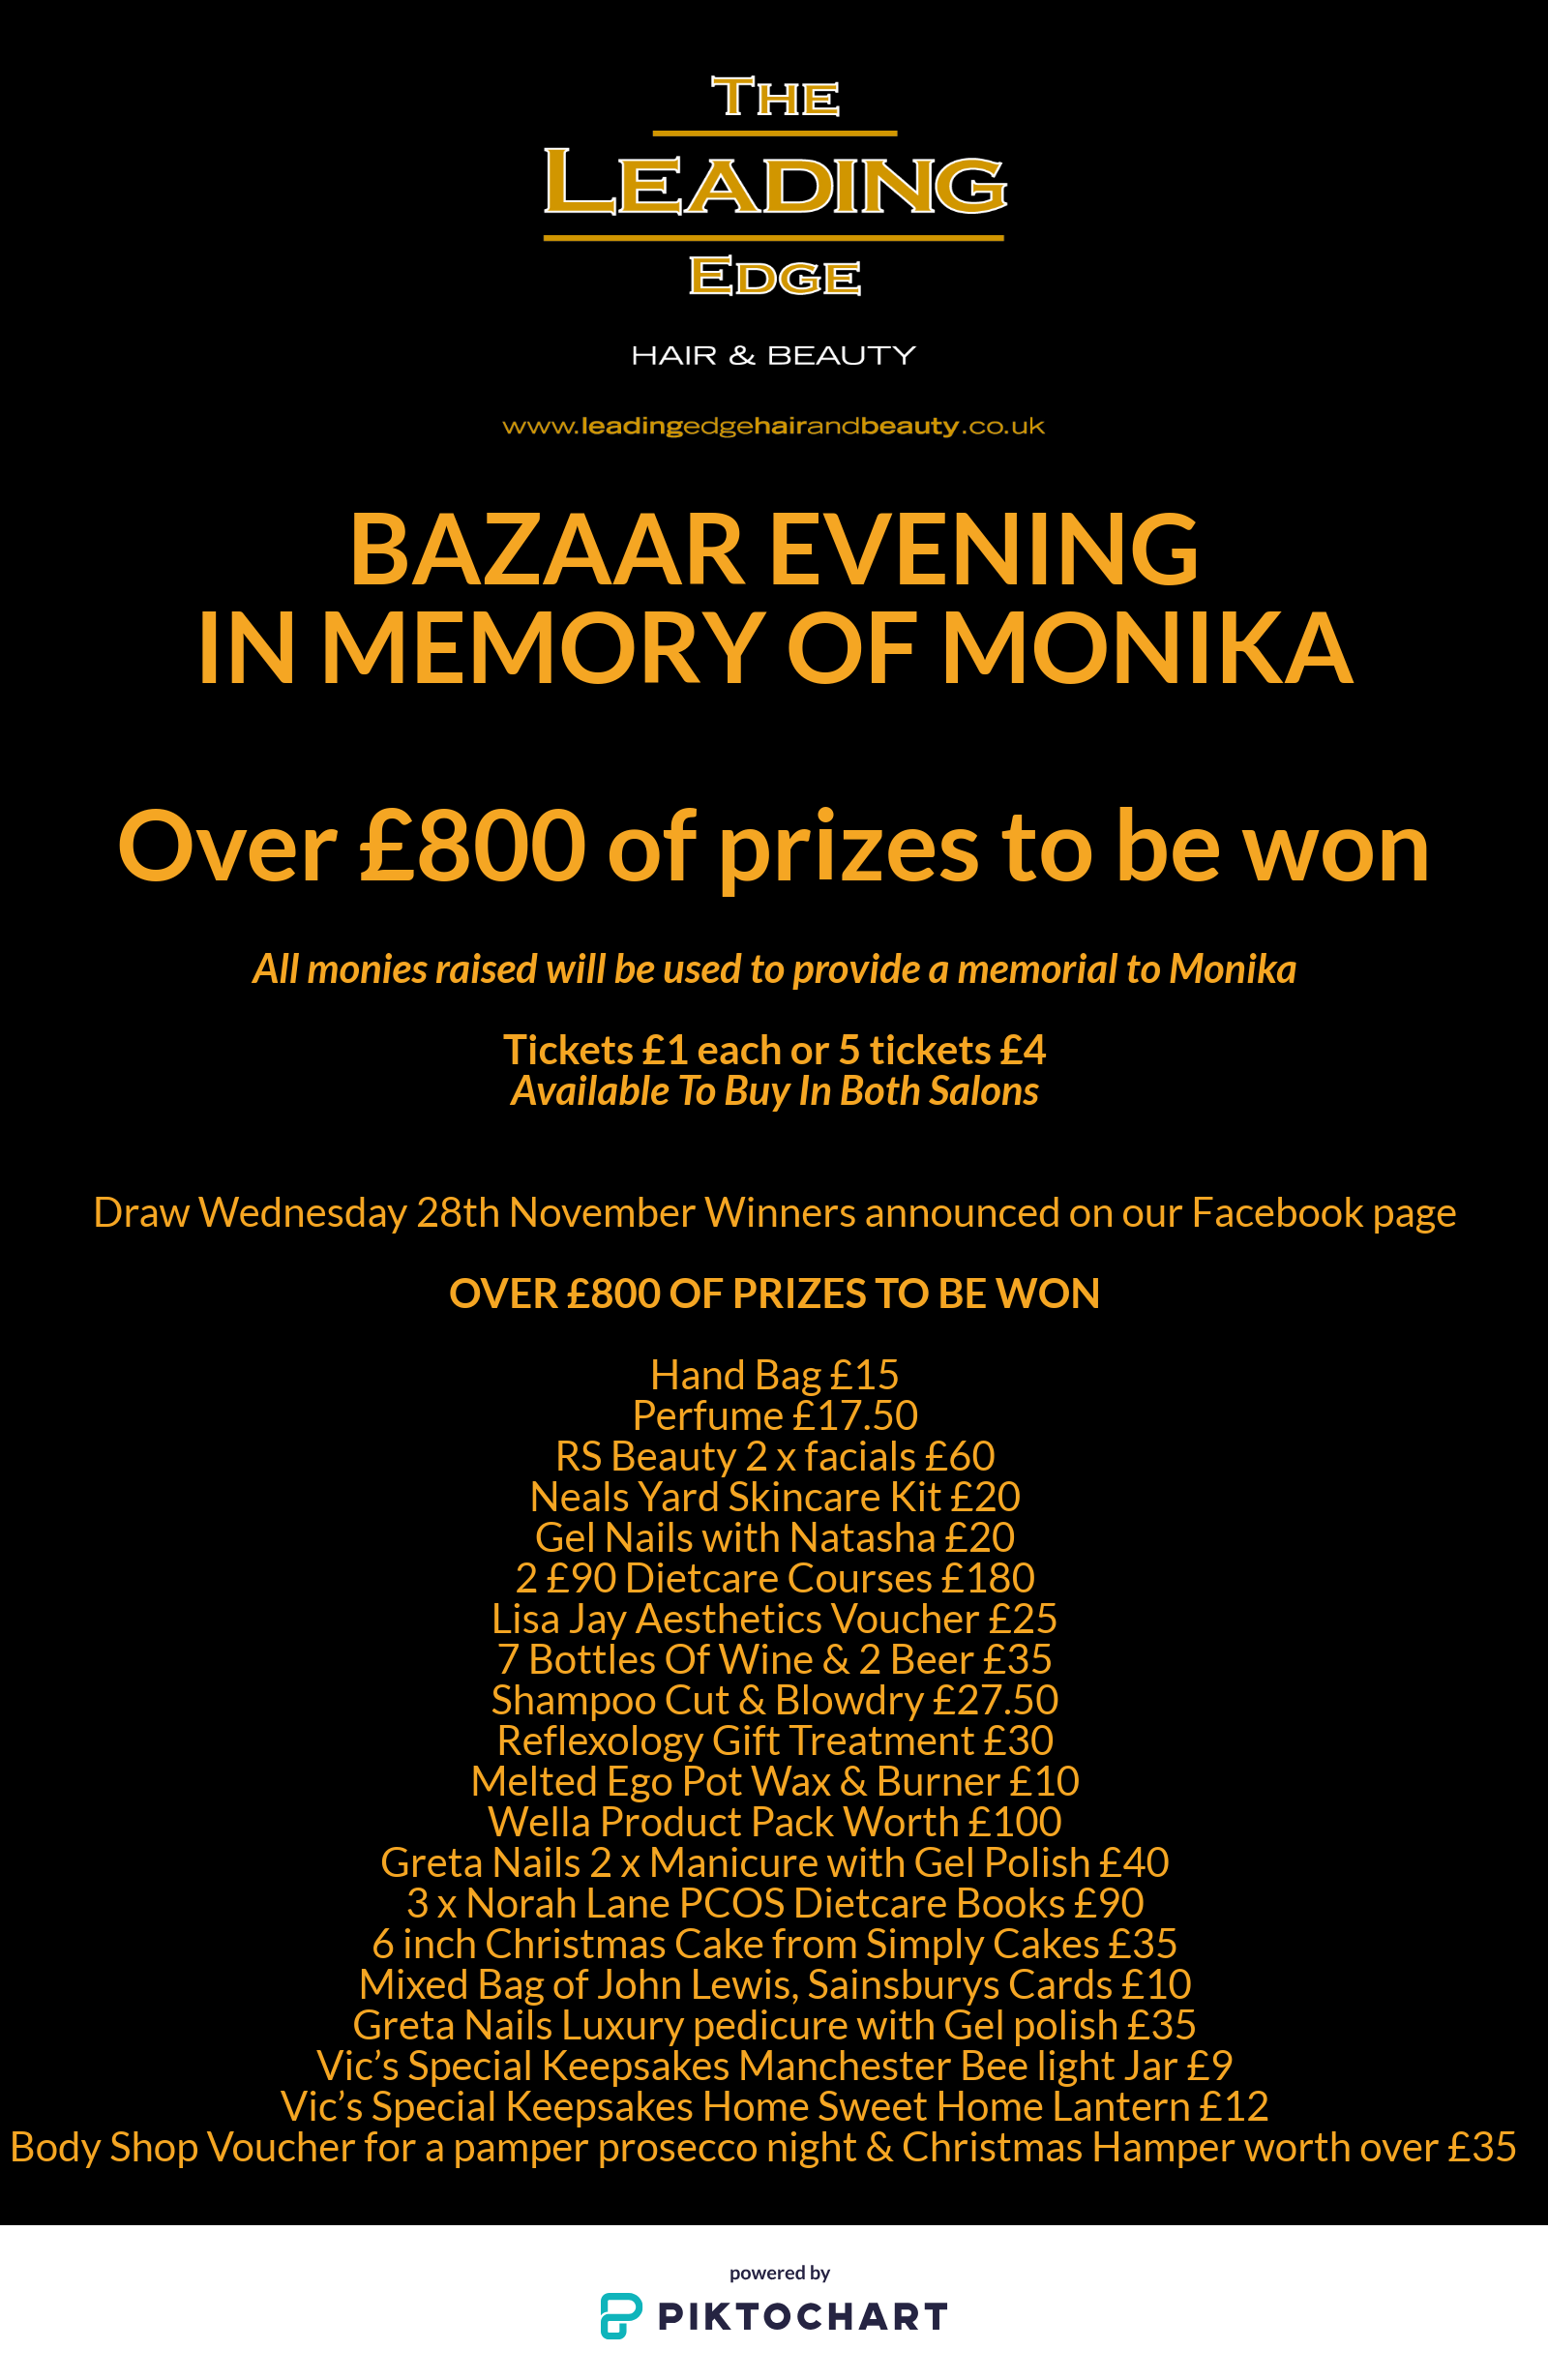 Bazaar Evening In Memory Of Monika Wednesday 28th November 6pm - 8.30pm